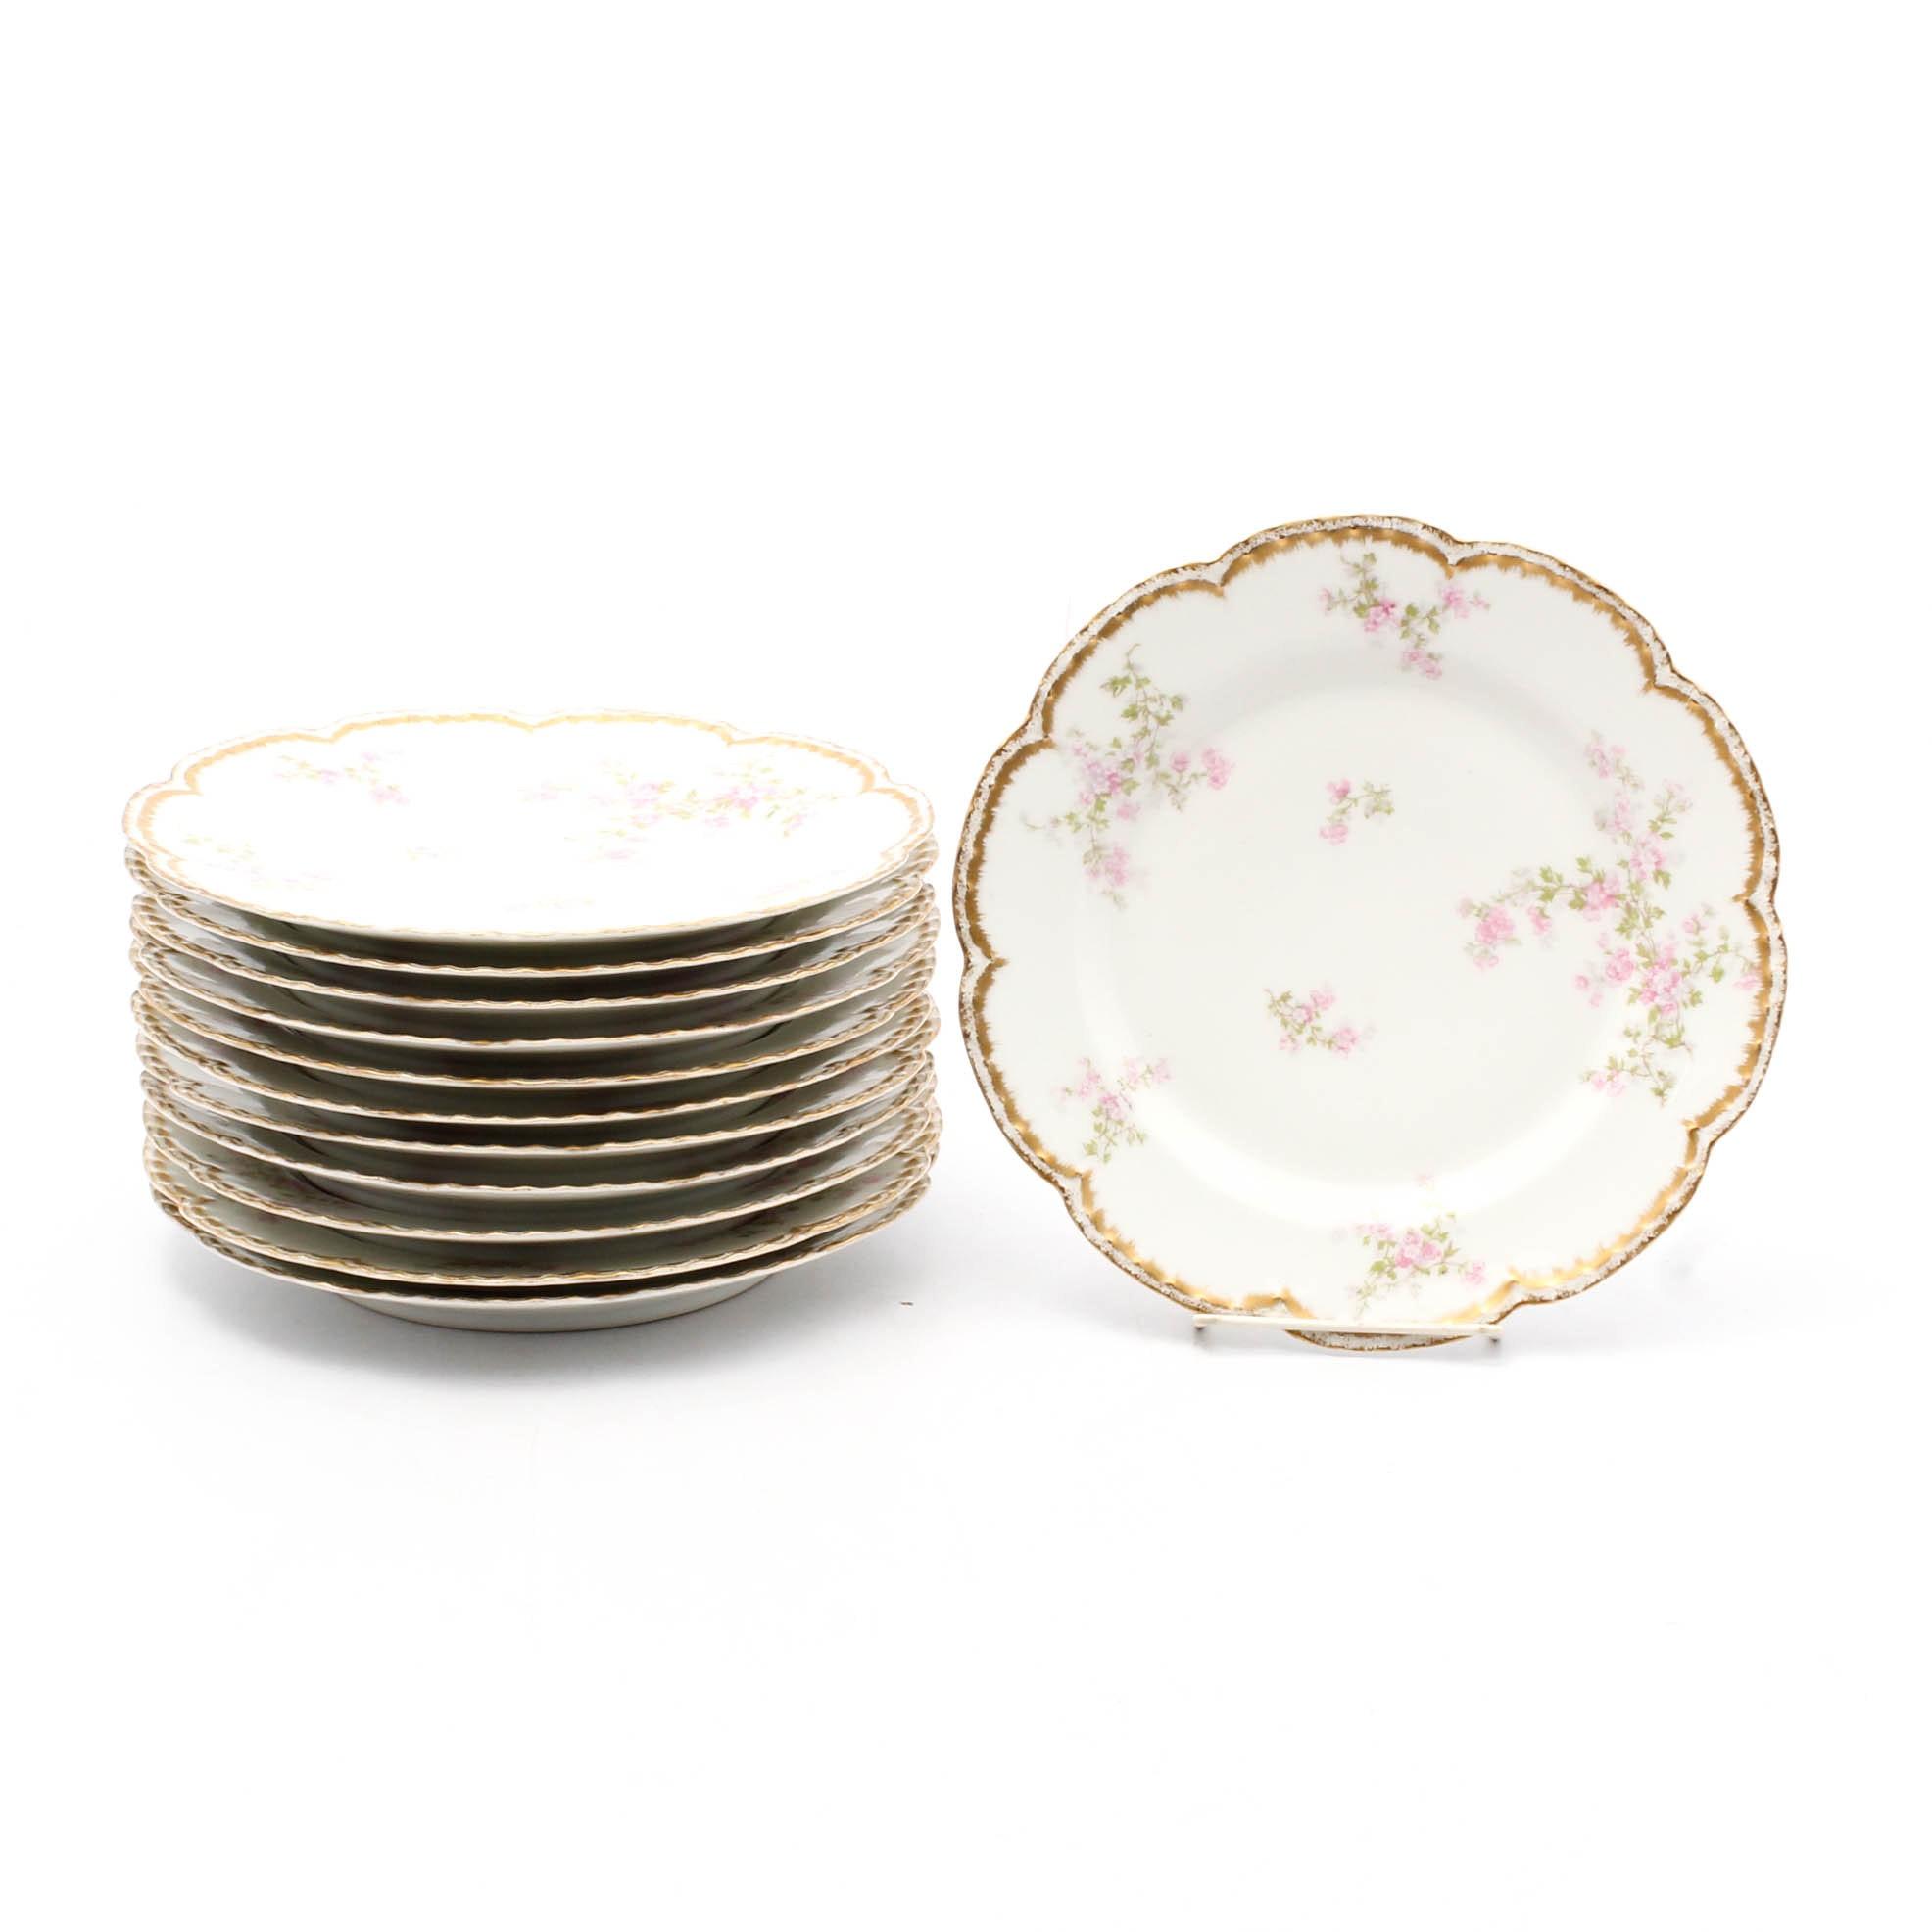 Haviland Limoges Dinner Plates